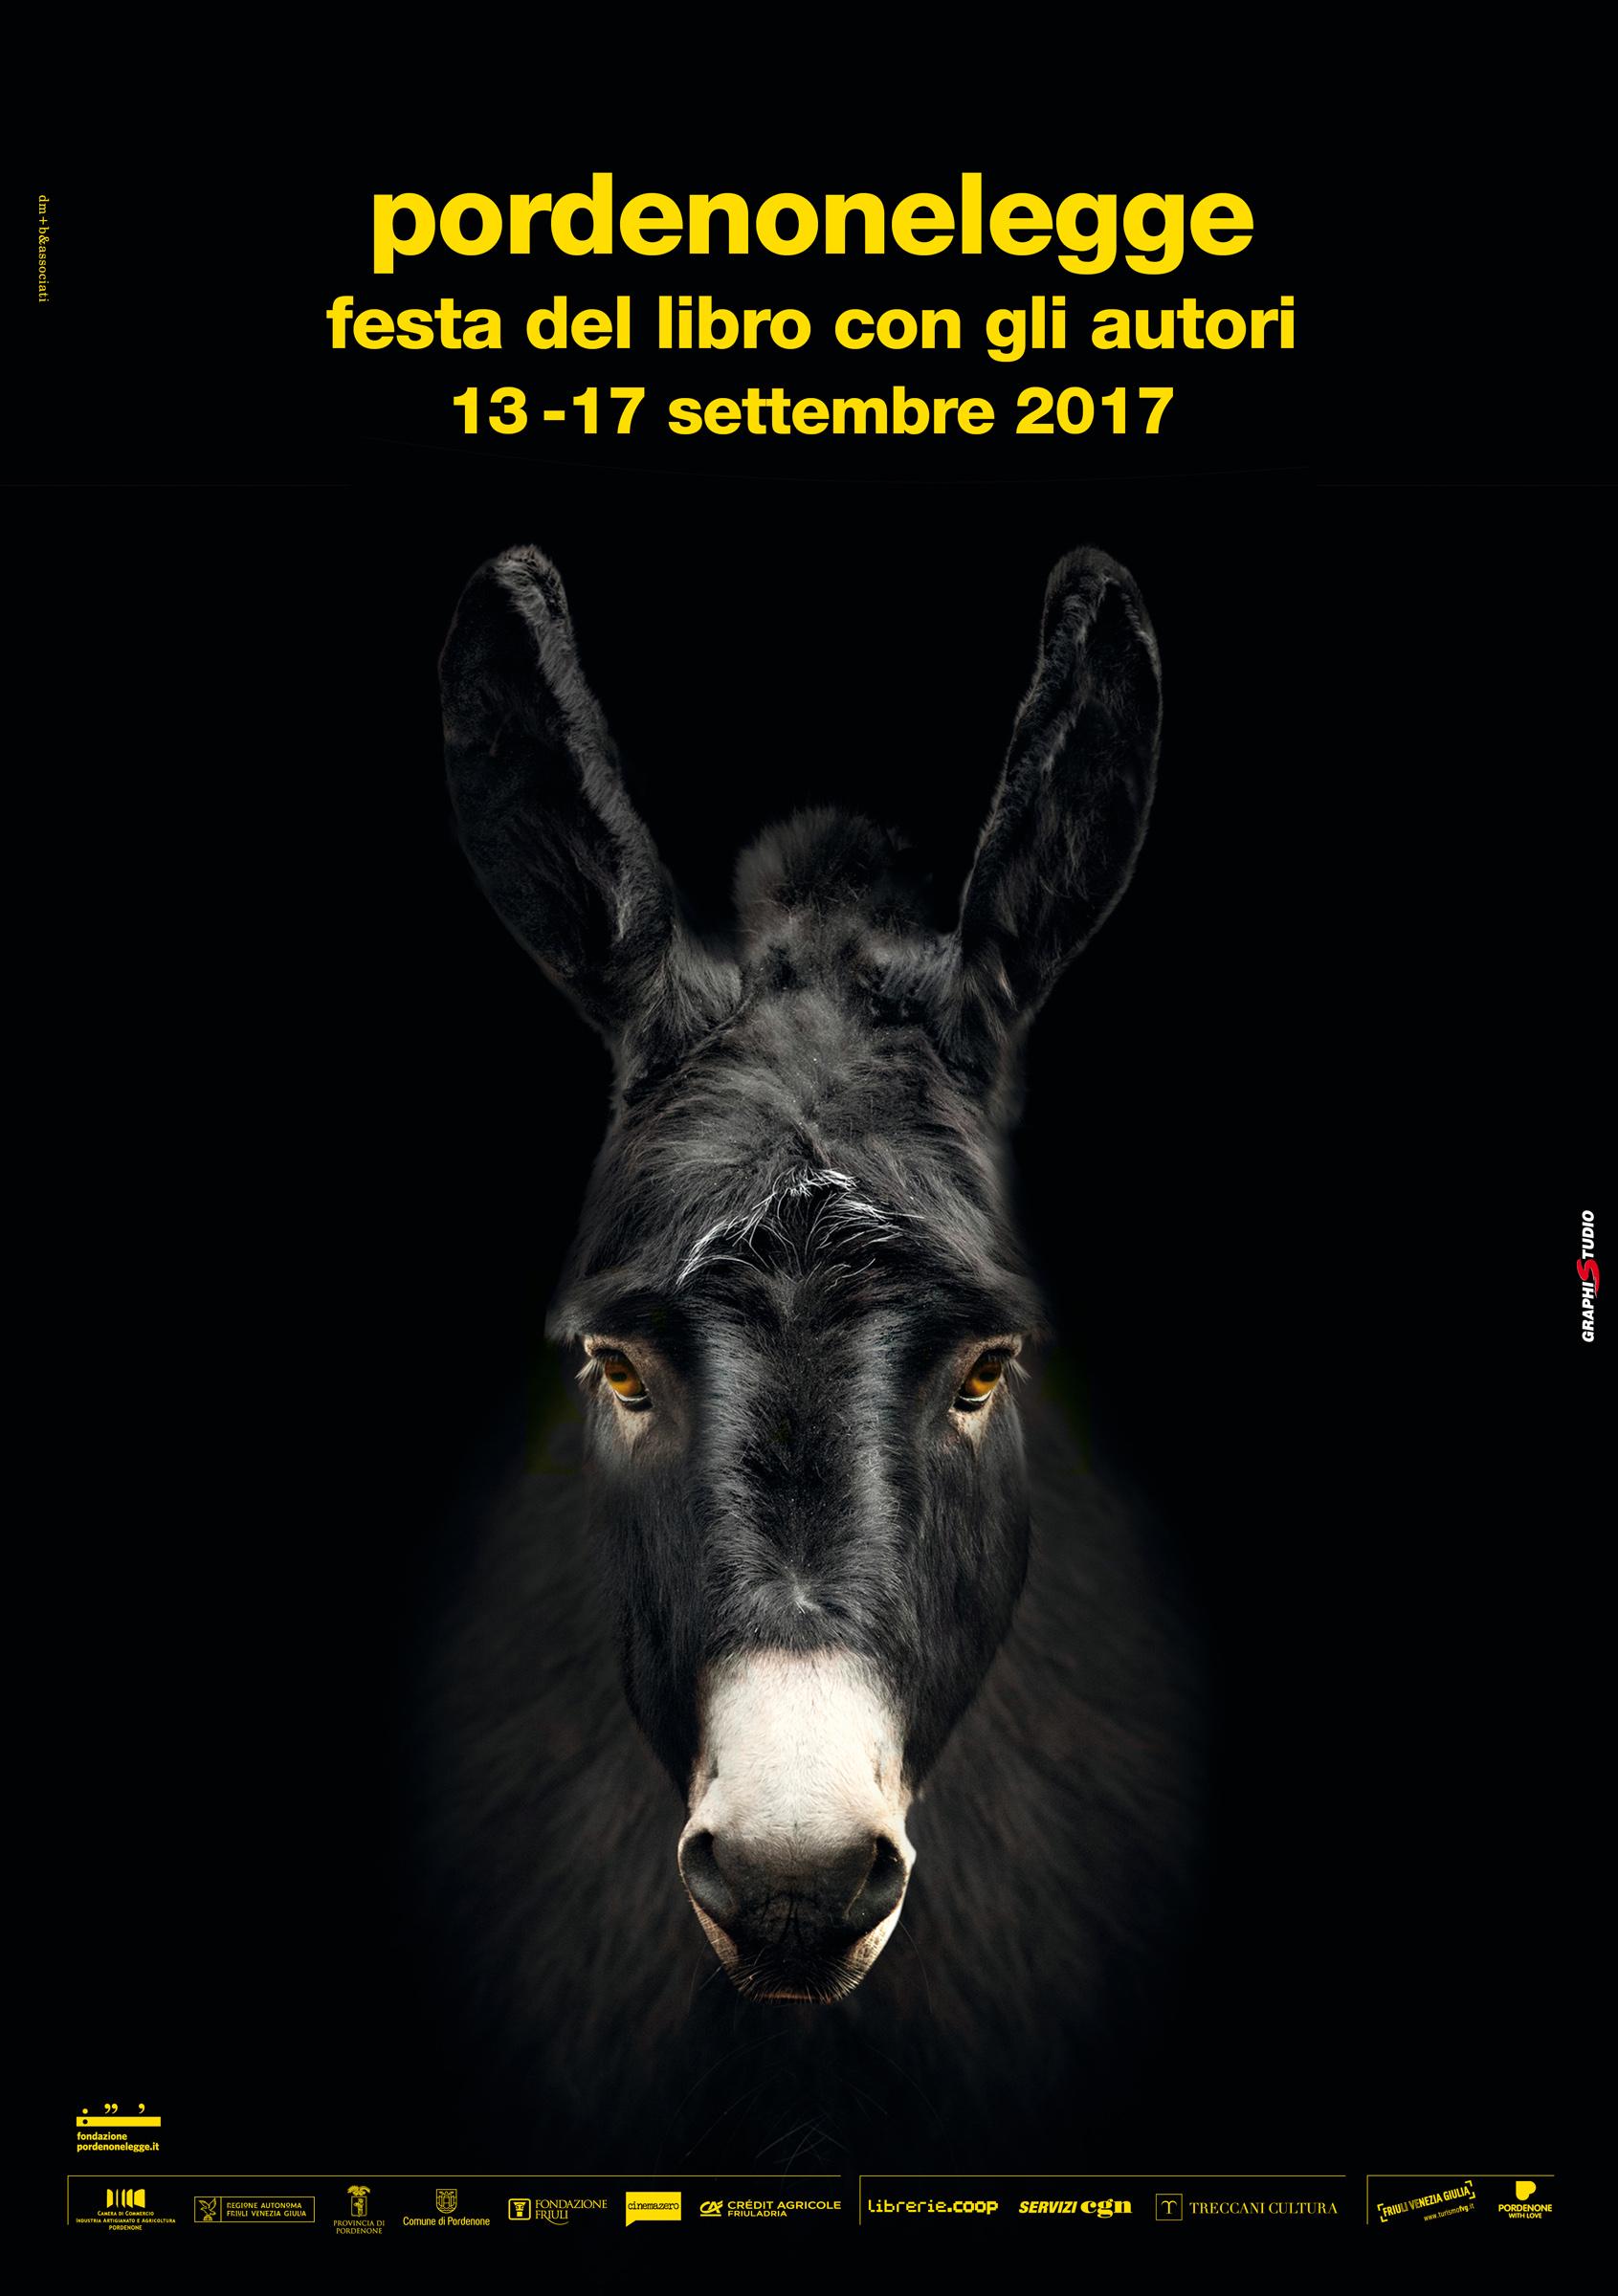 PNLEGGE locandina 2017